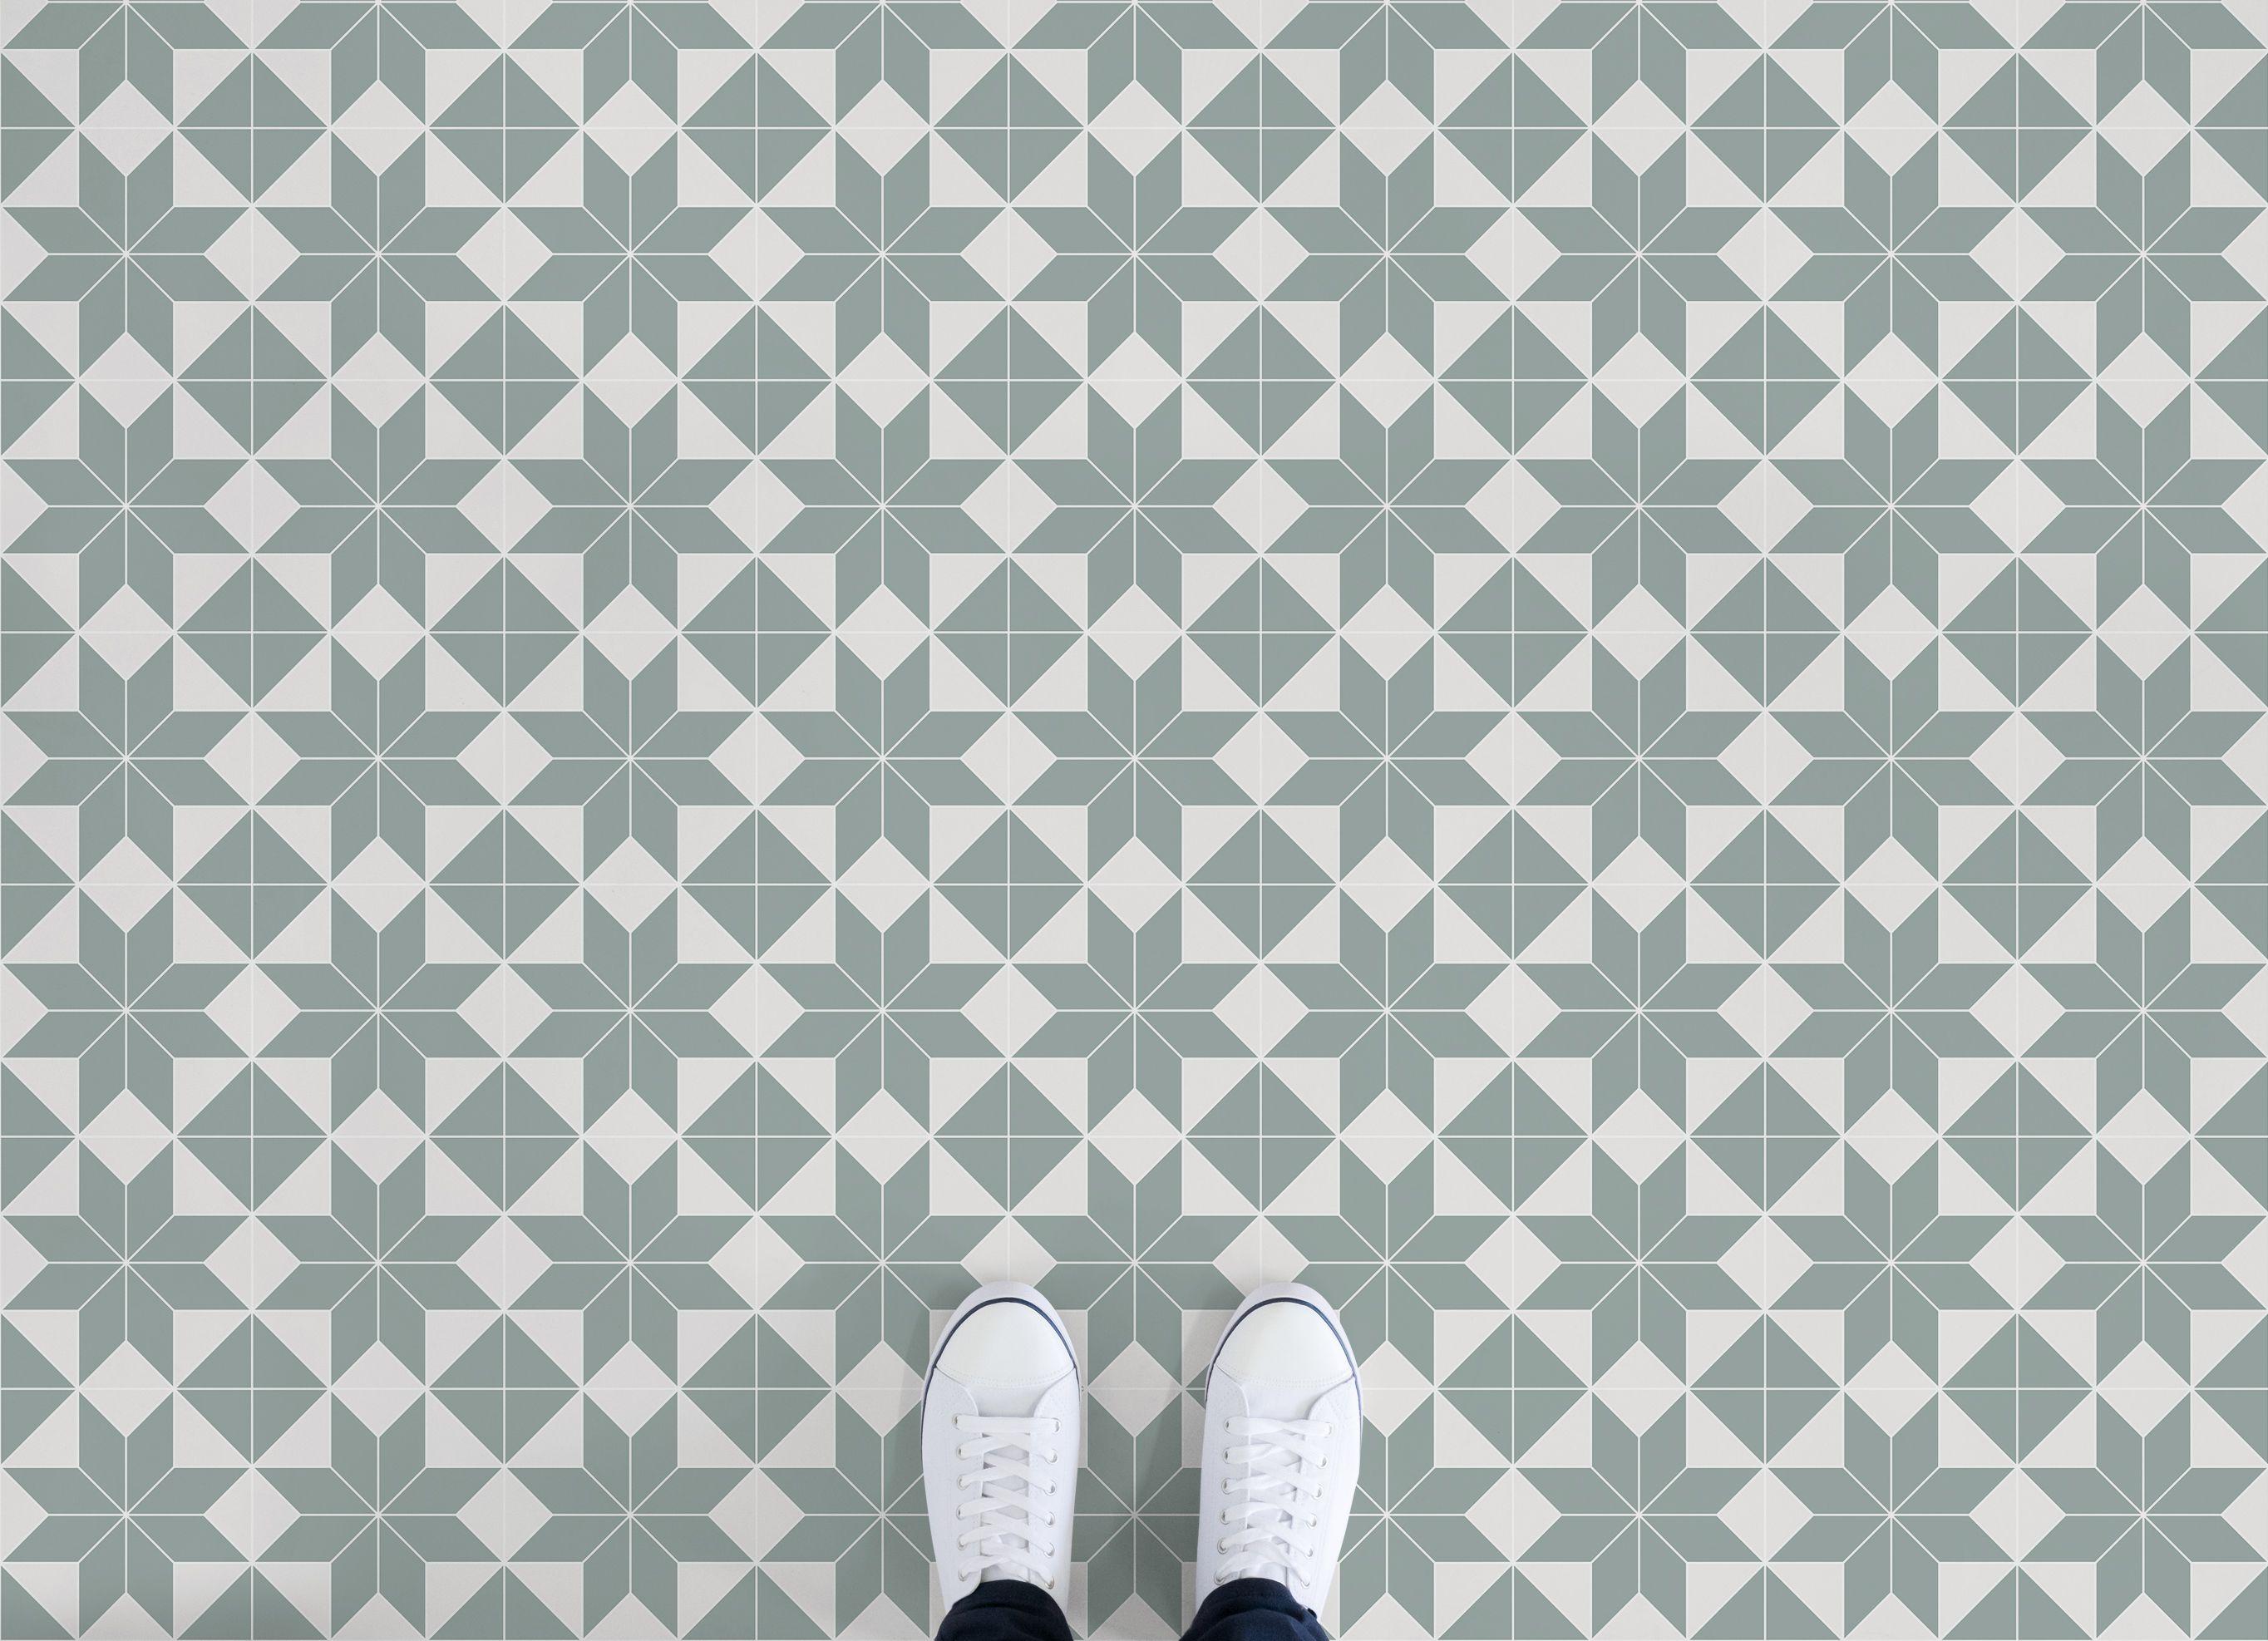 Victorian Tile Effect Vinyl Flooring | Pinterest ...